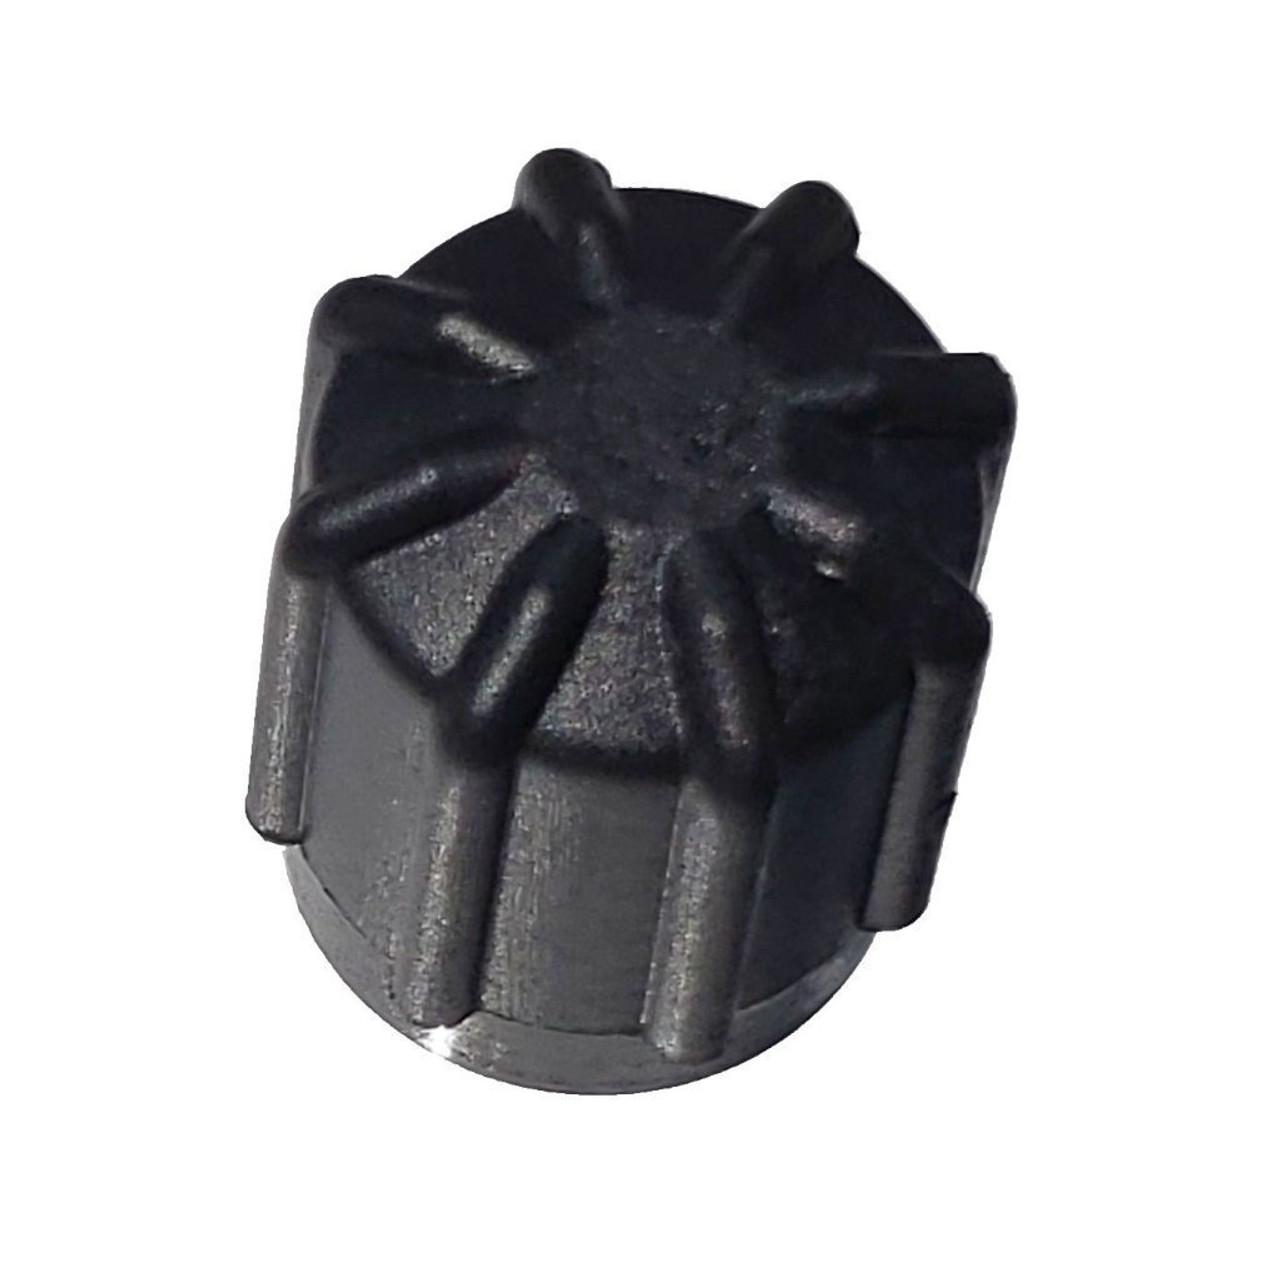 AC Service Cap Black - Interchanges: BMW 64538387437, 64538390633, 66206003001, Delco 15-5457, GM 25613359